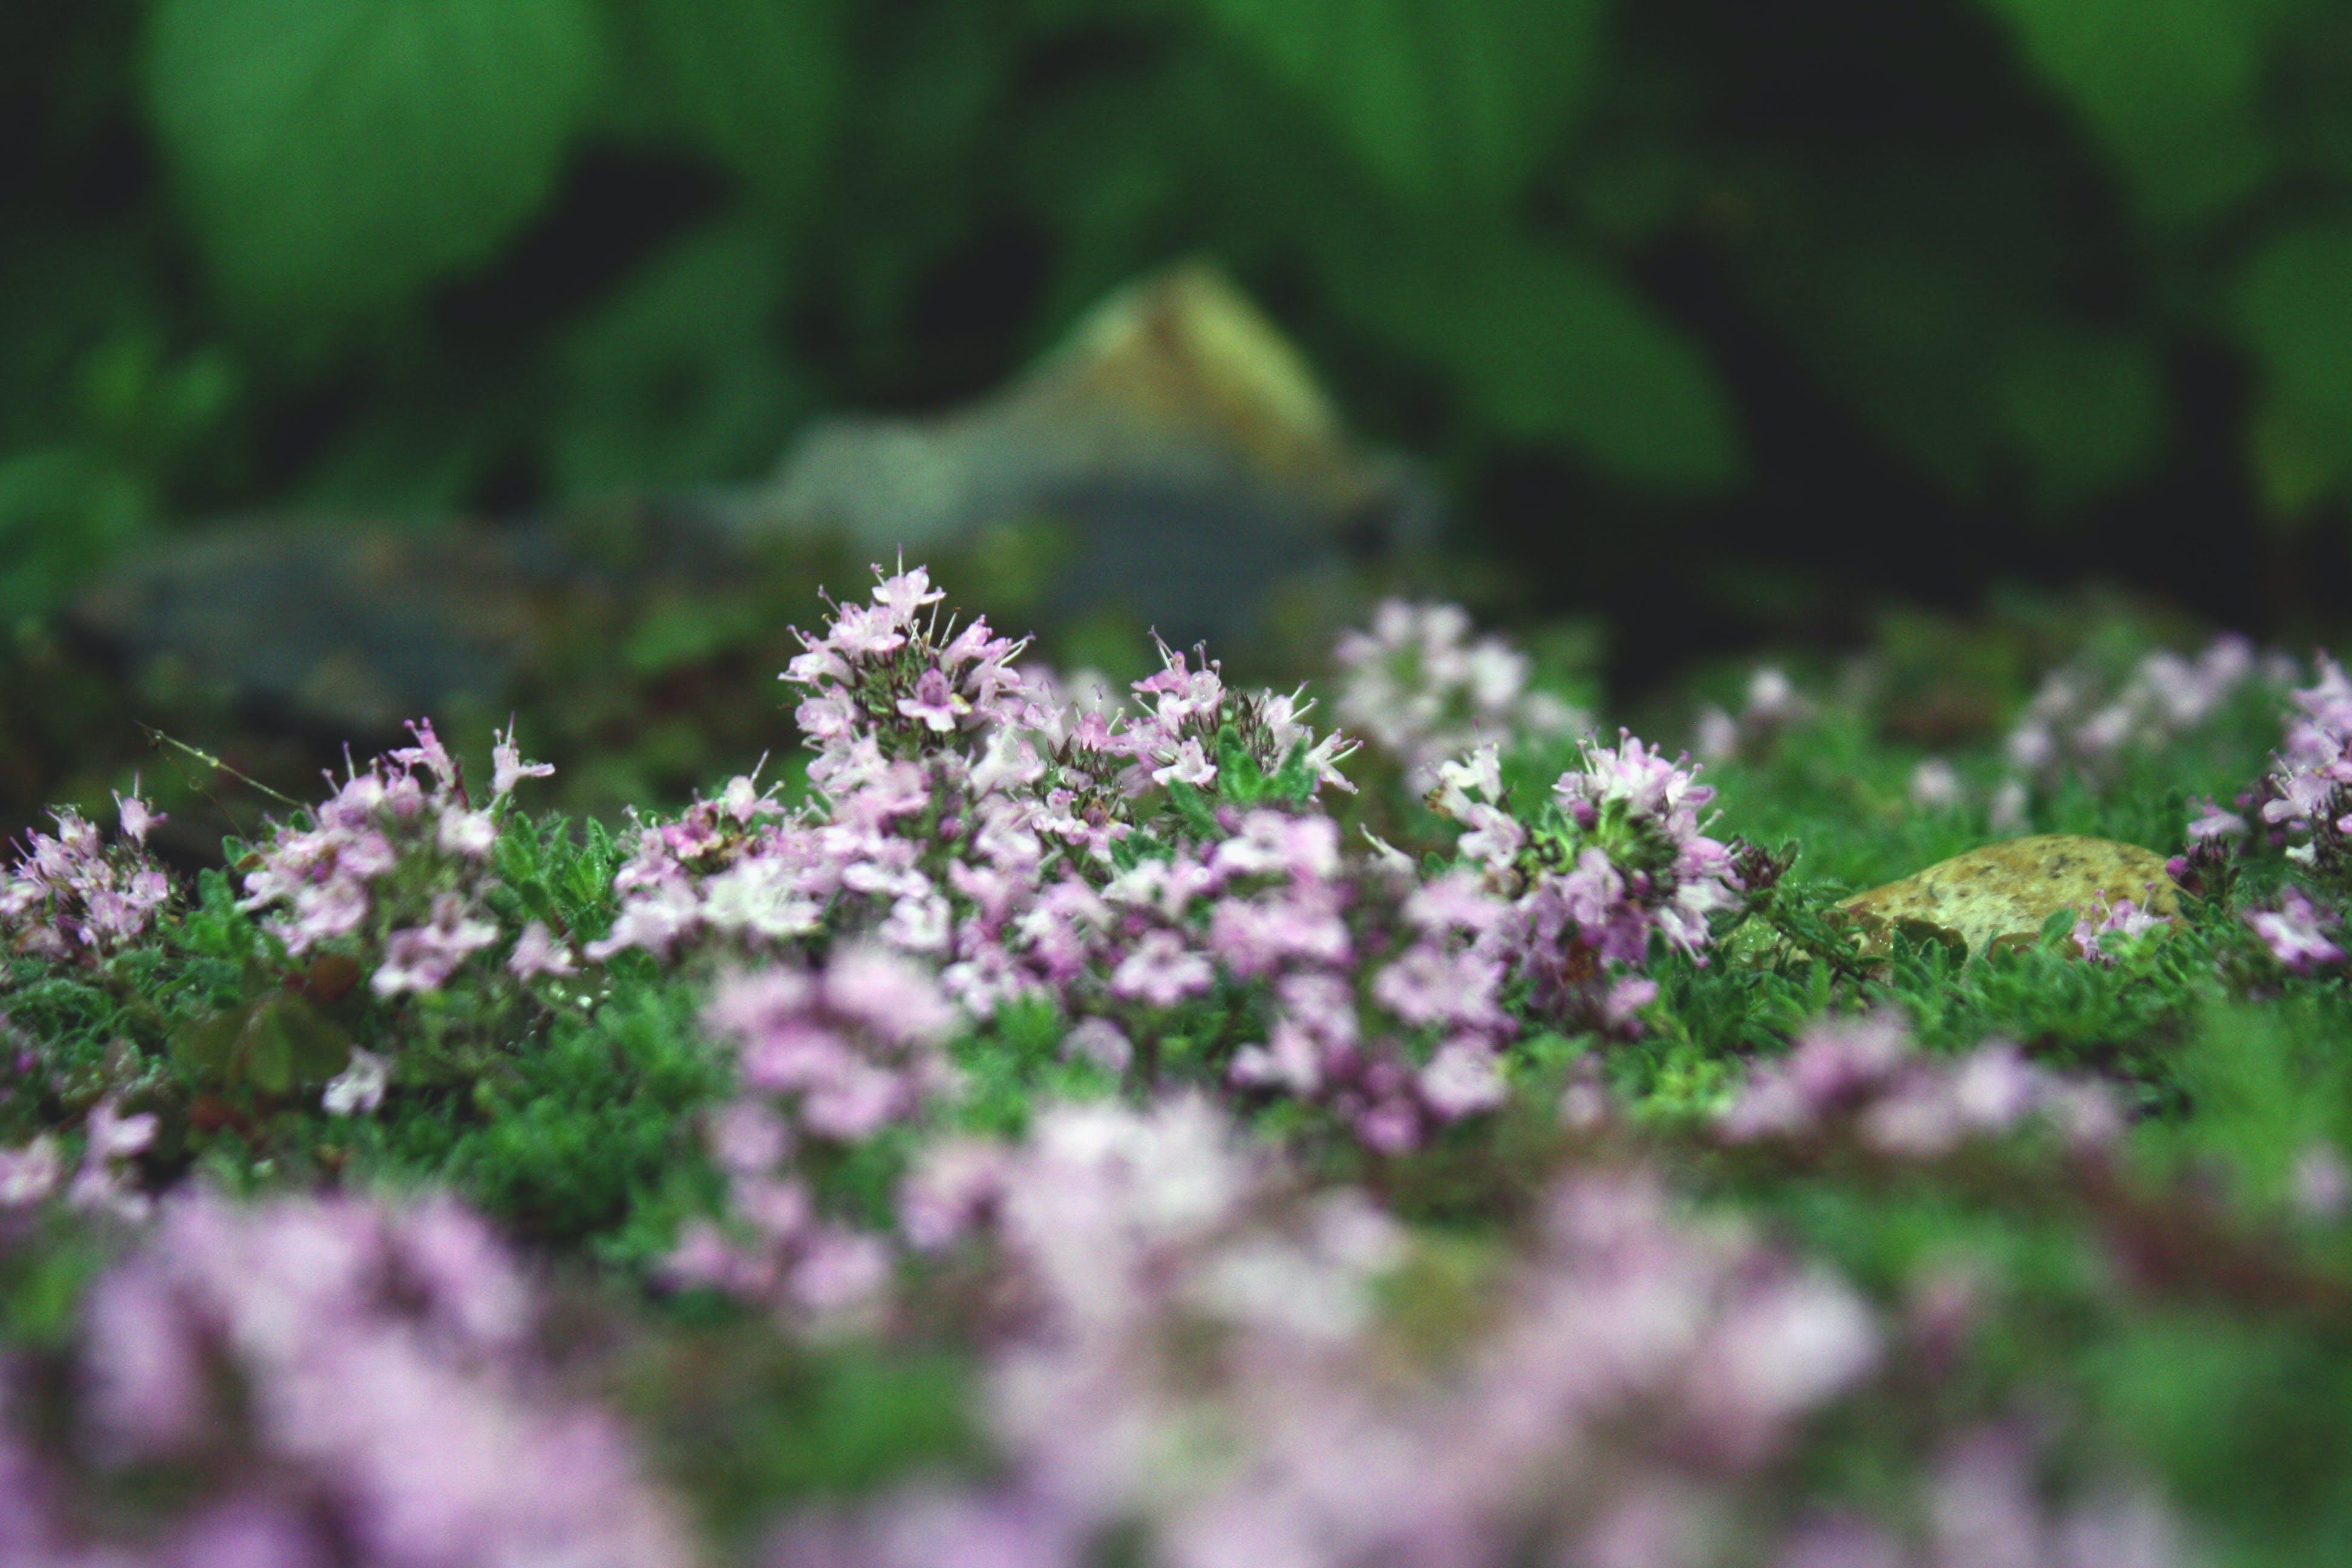 Free stock photo of garden, flower, clover, close up